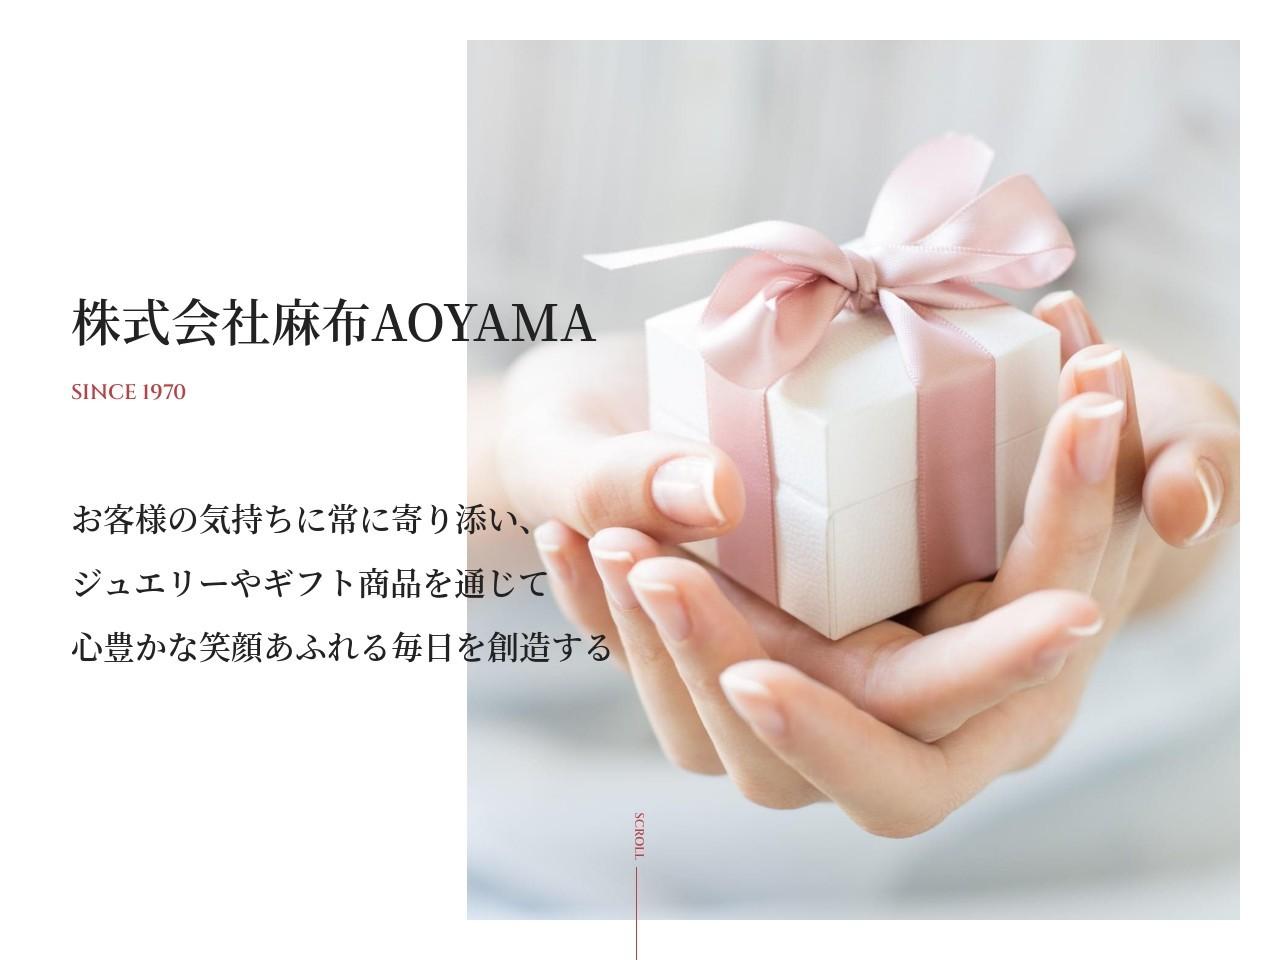 青山宝飾 | Aoyama Jewelry